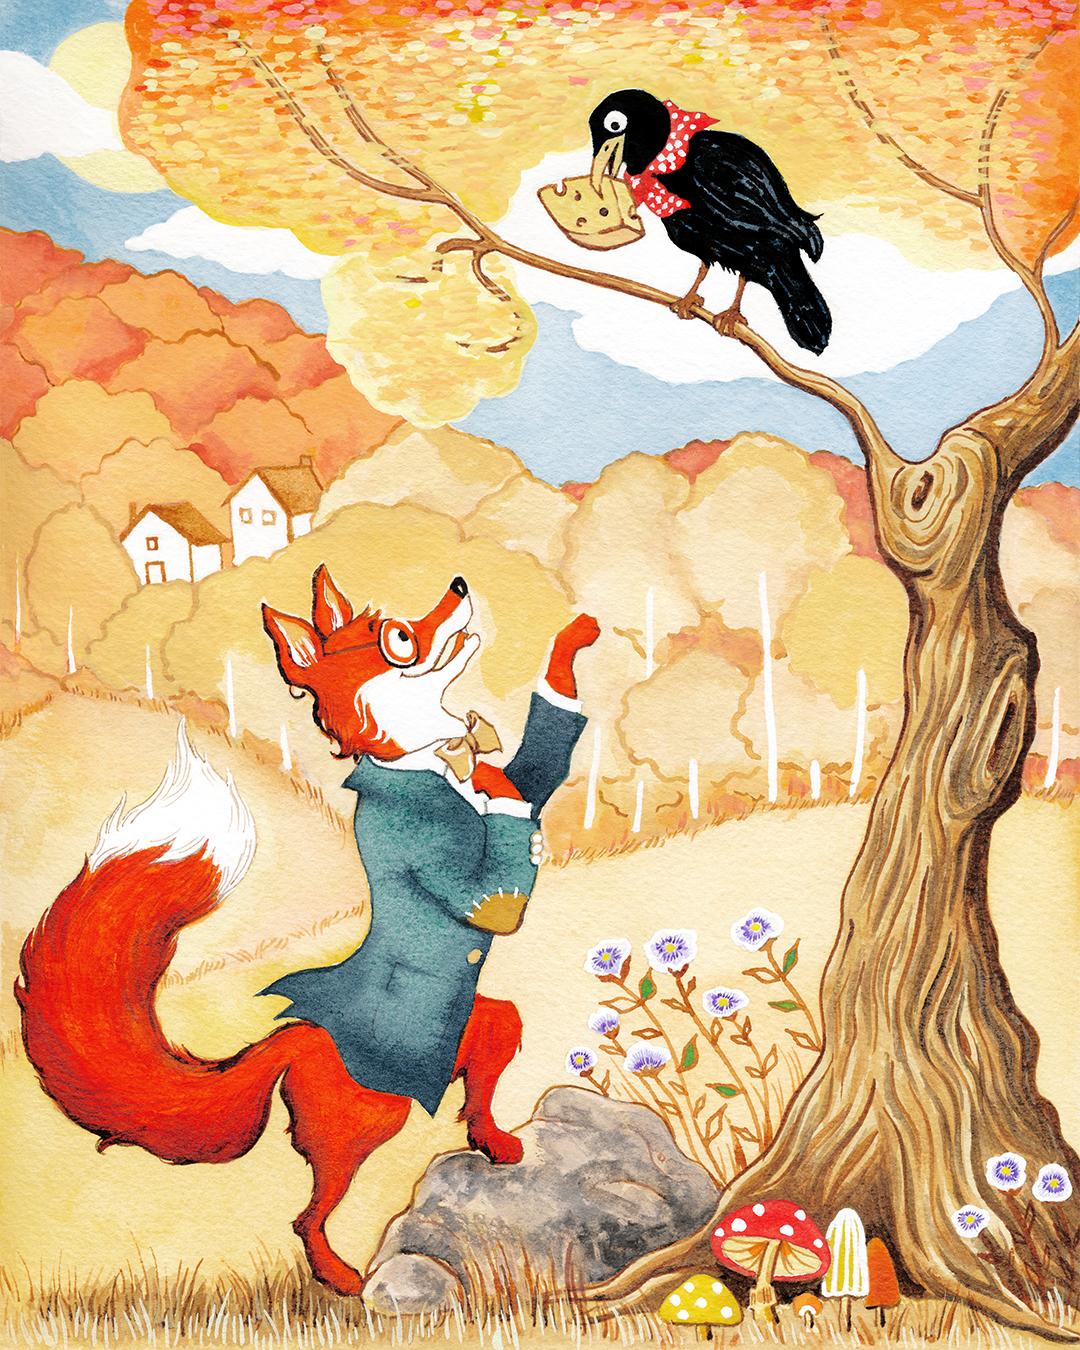 Girlsclub-Asia-12_LilyQian_illustration_The Fox and the Crow